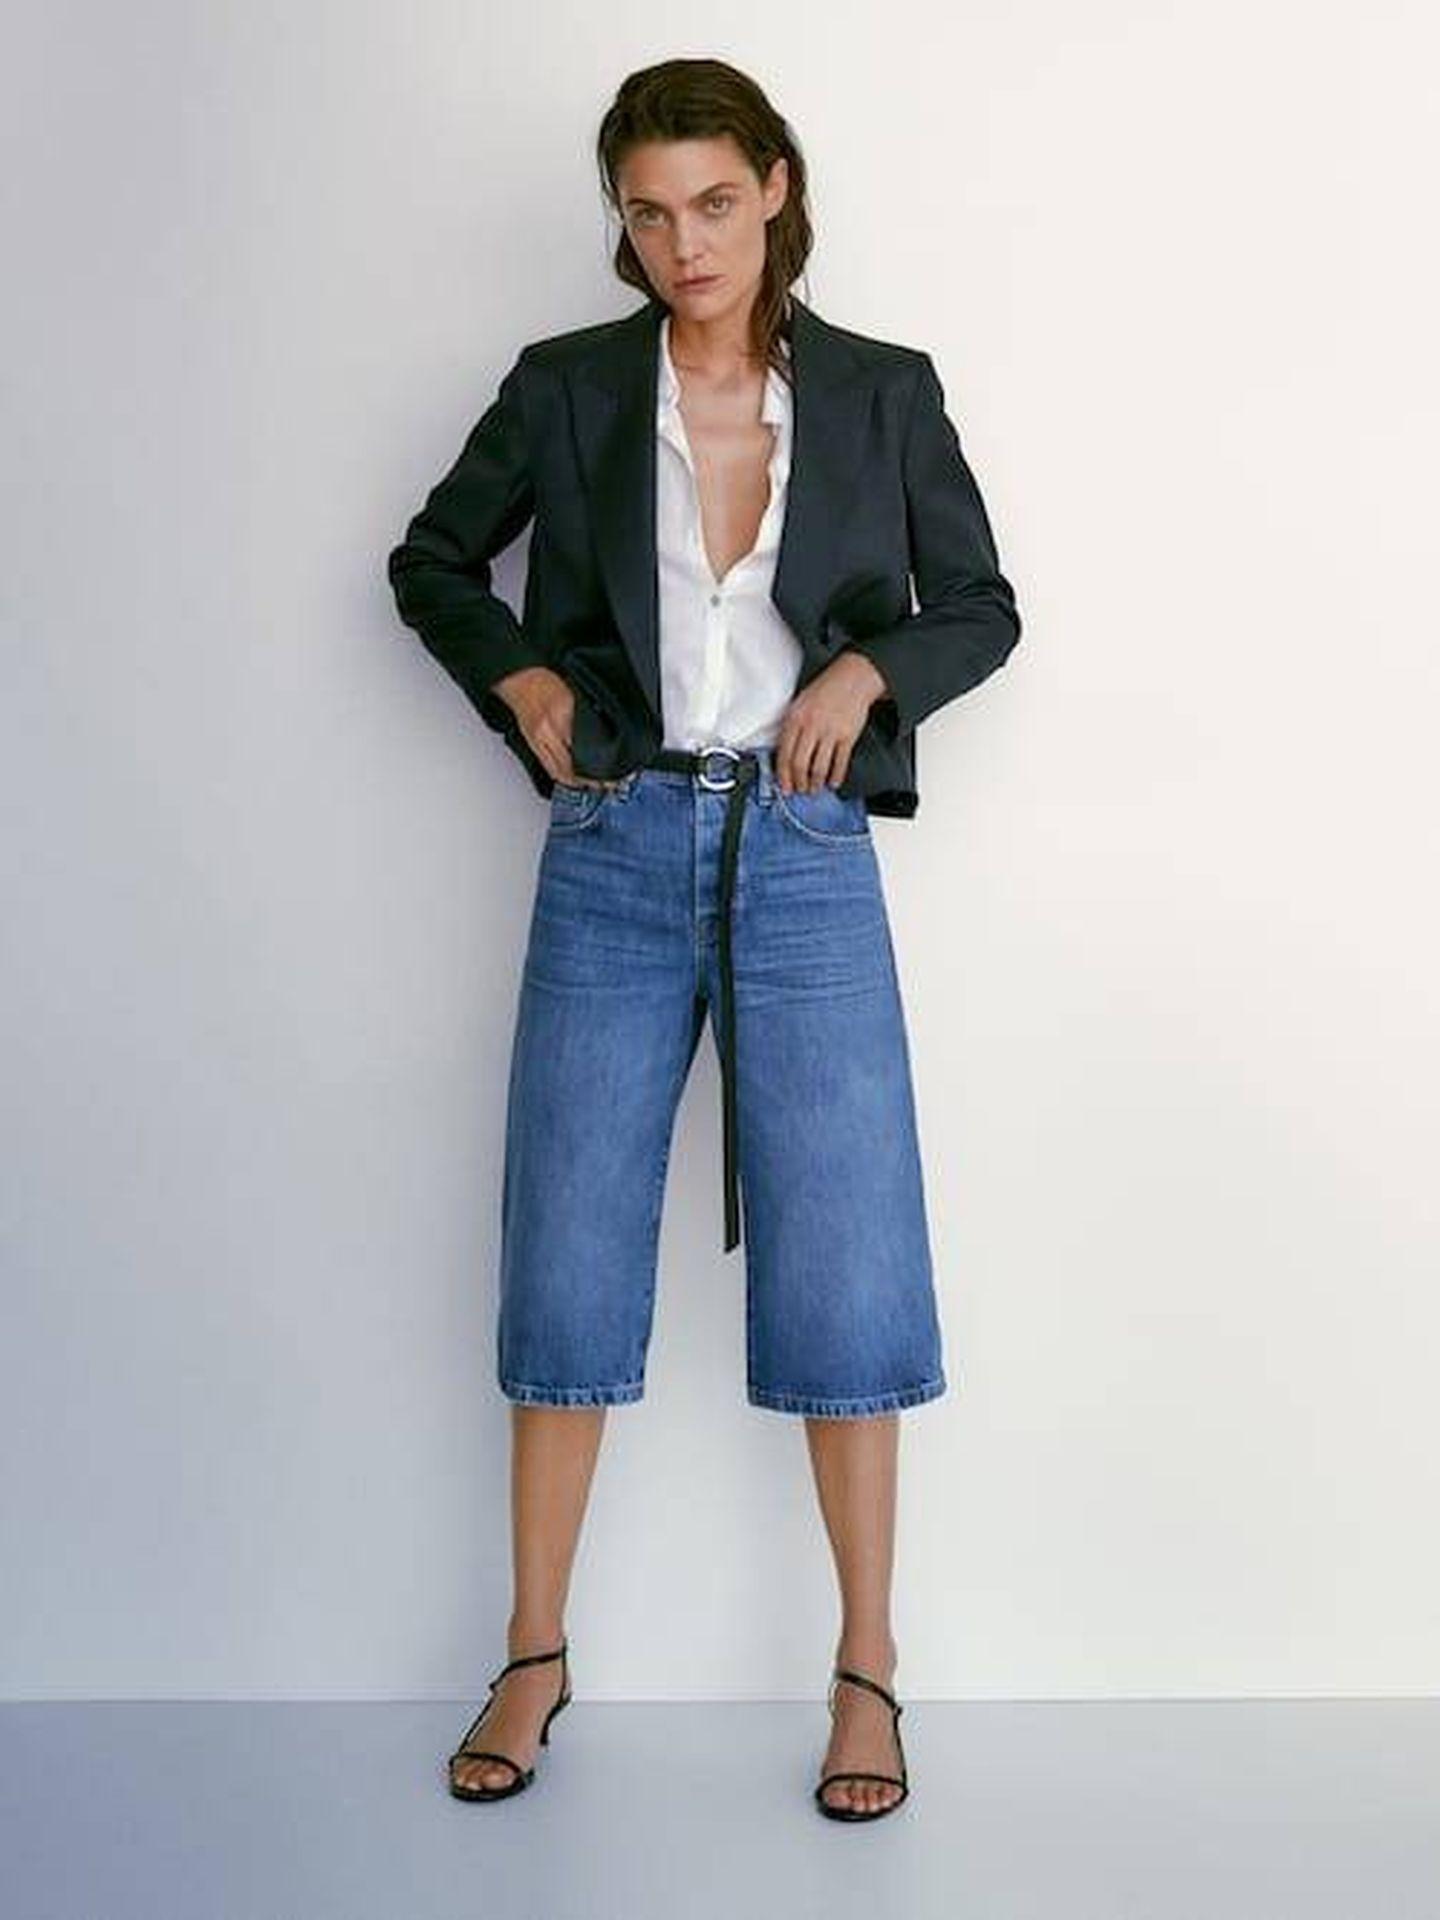 La nueva falda pantalón de Massimo Dutti. (Cortesía)